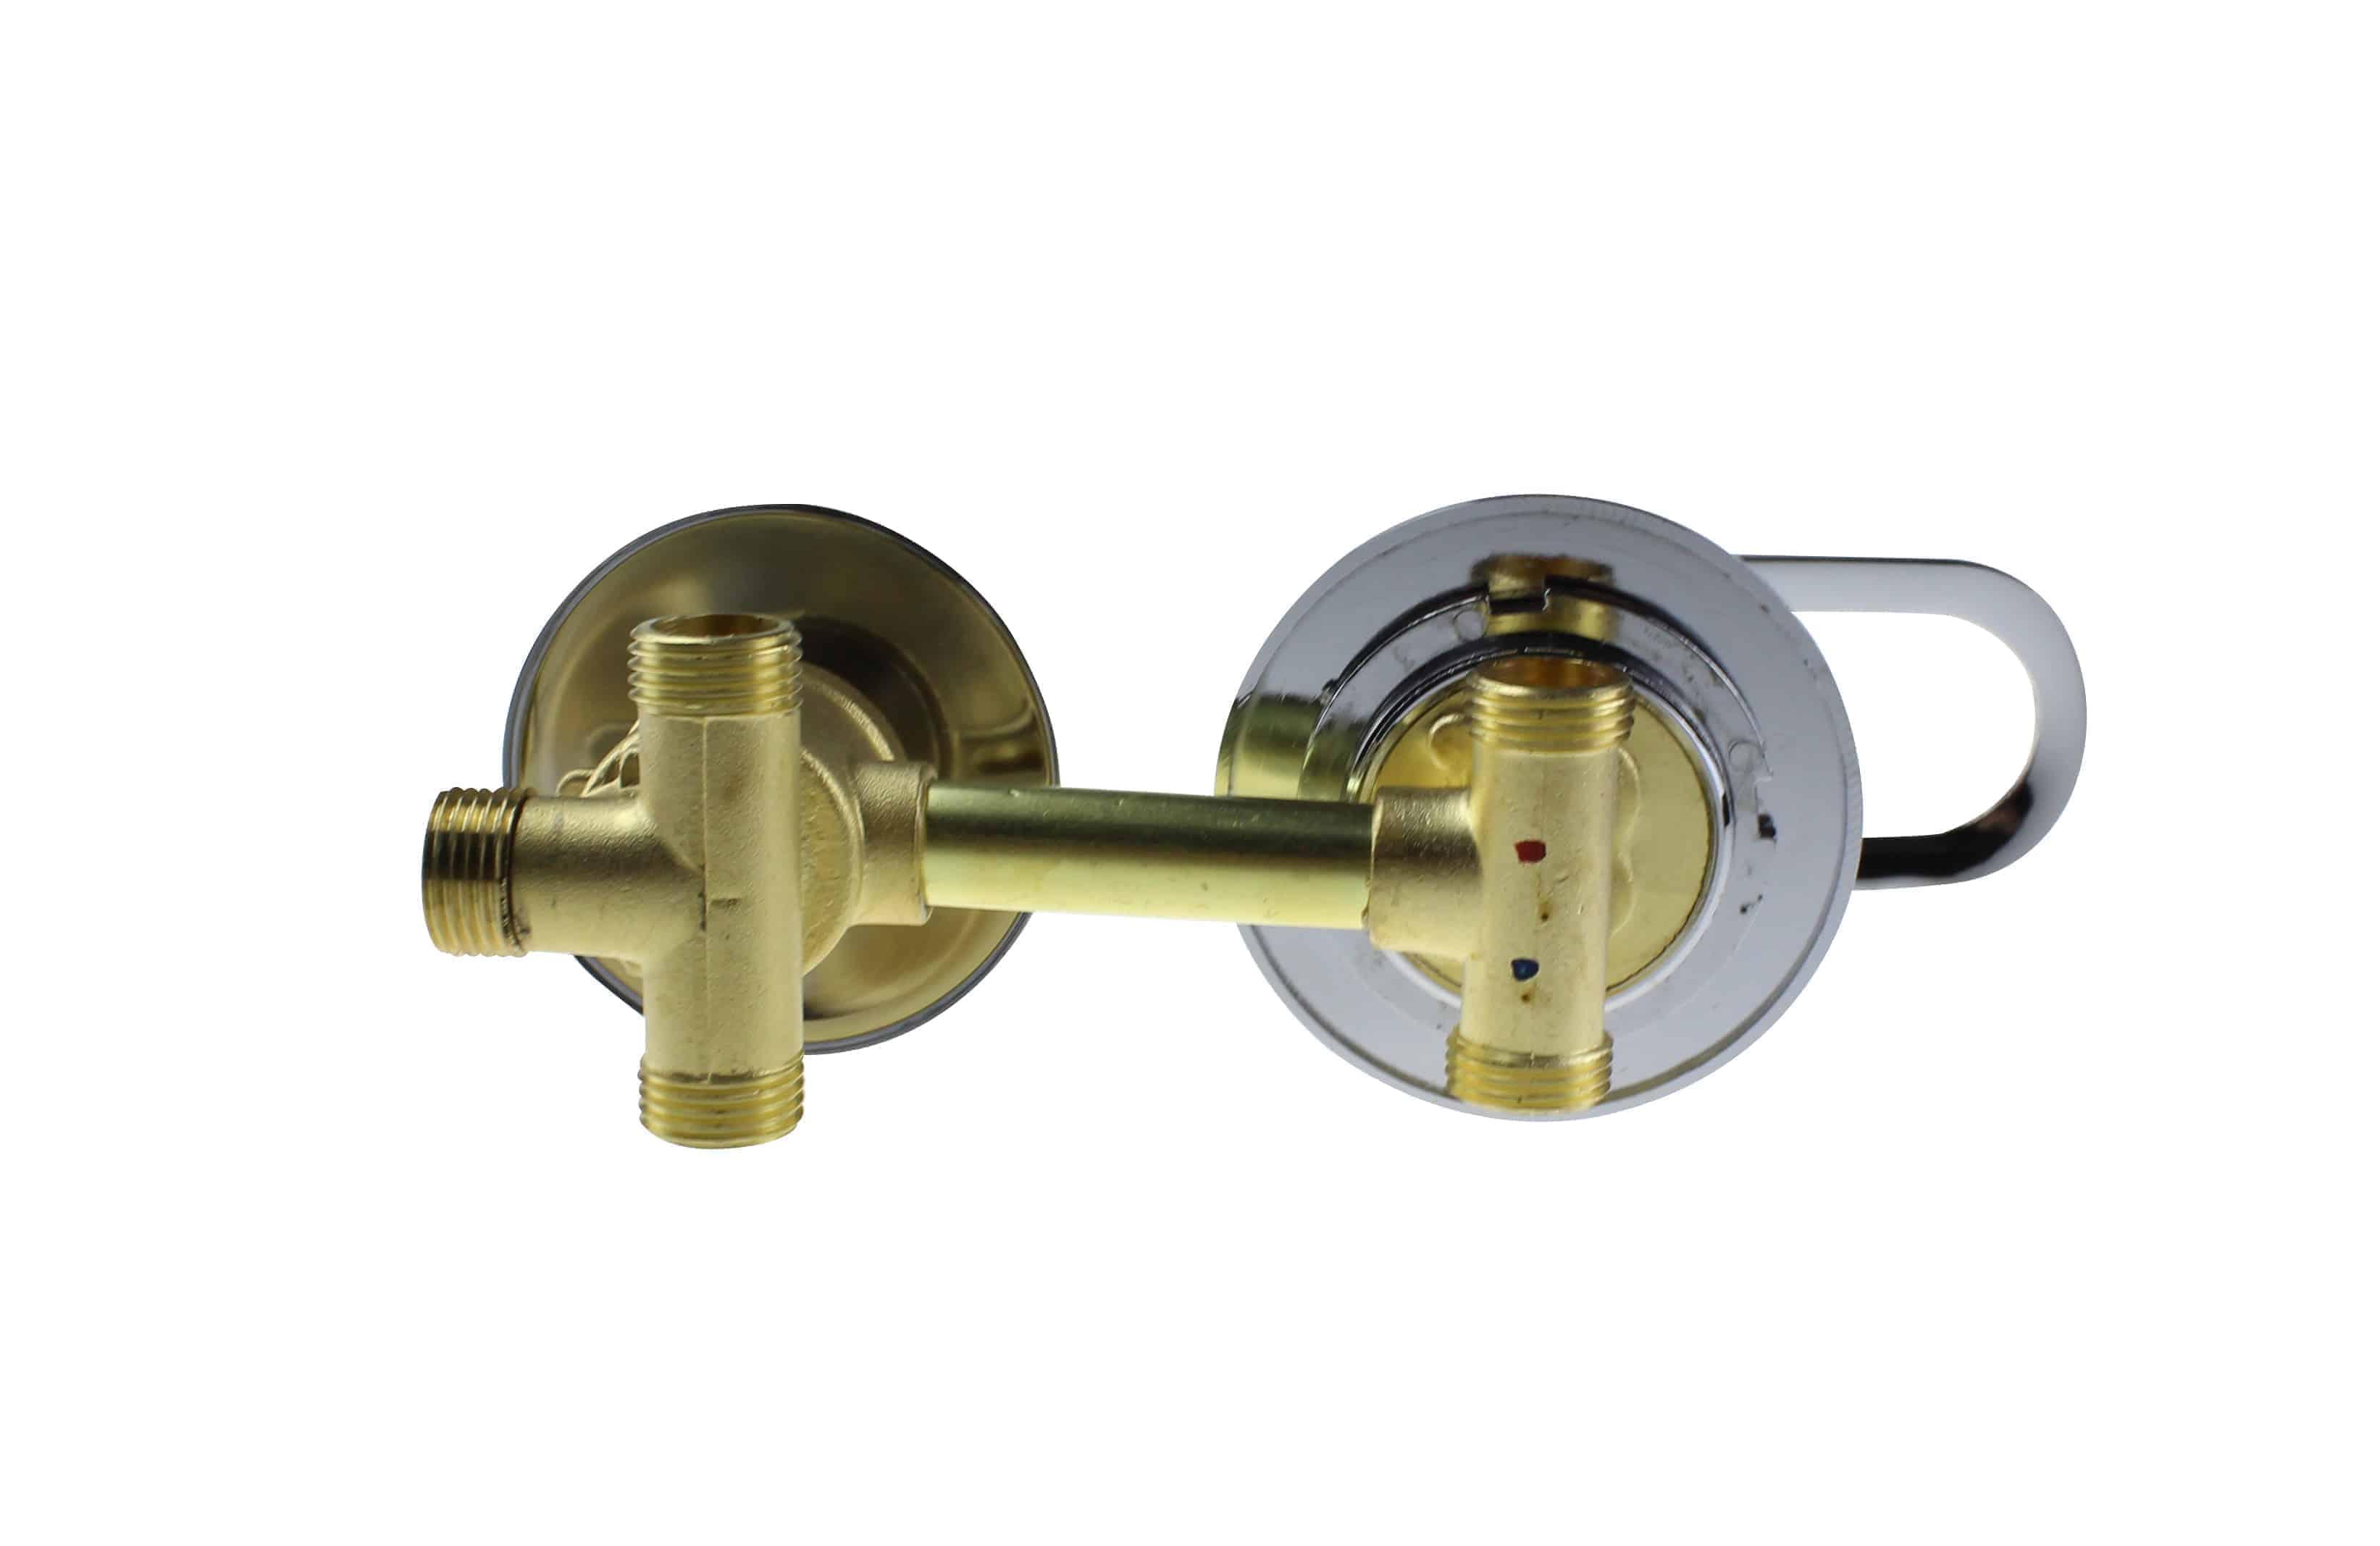 2 dial shower mixer valve threaded 120mm centres. Black Bedroom Furniture Sets. Home Design Ideas